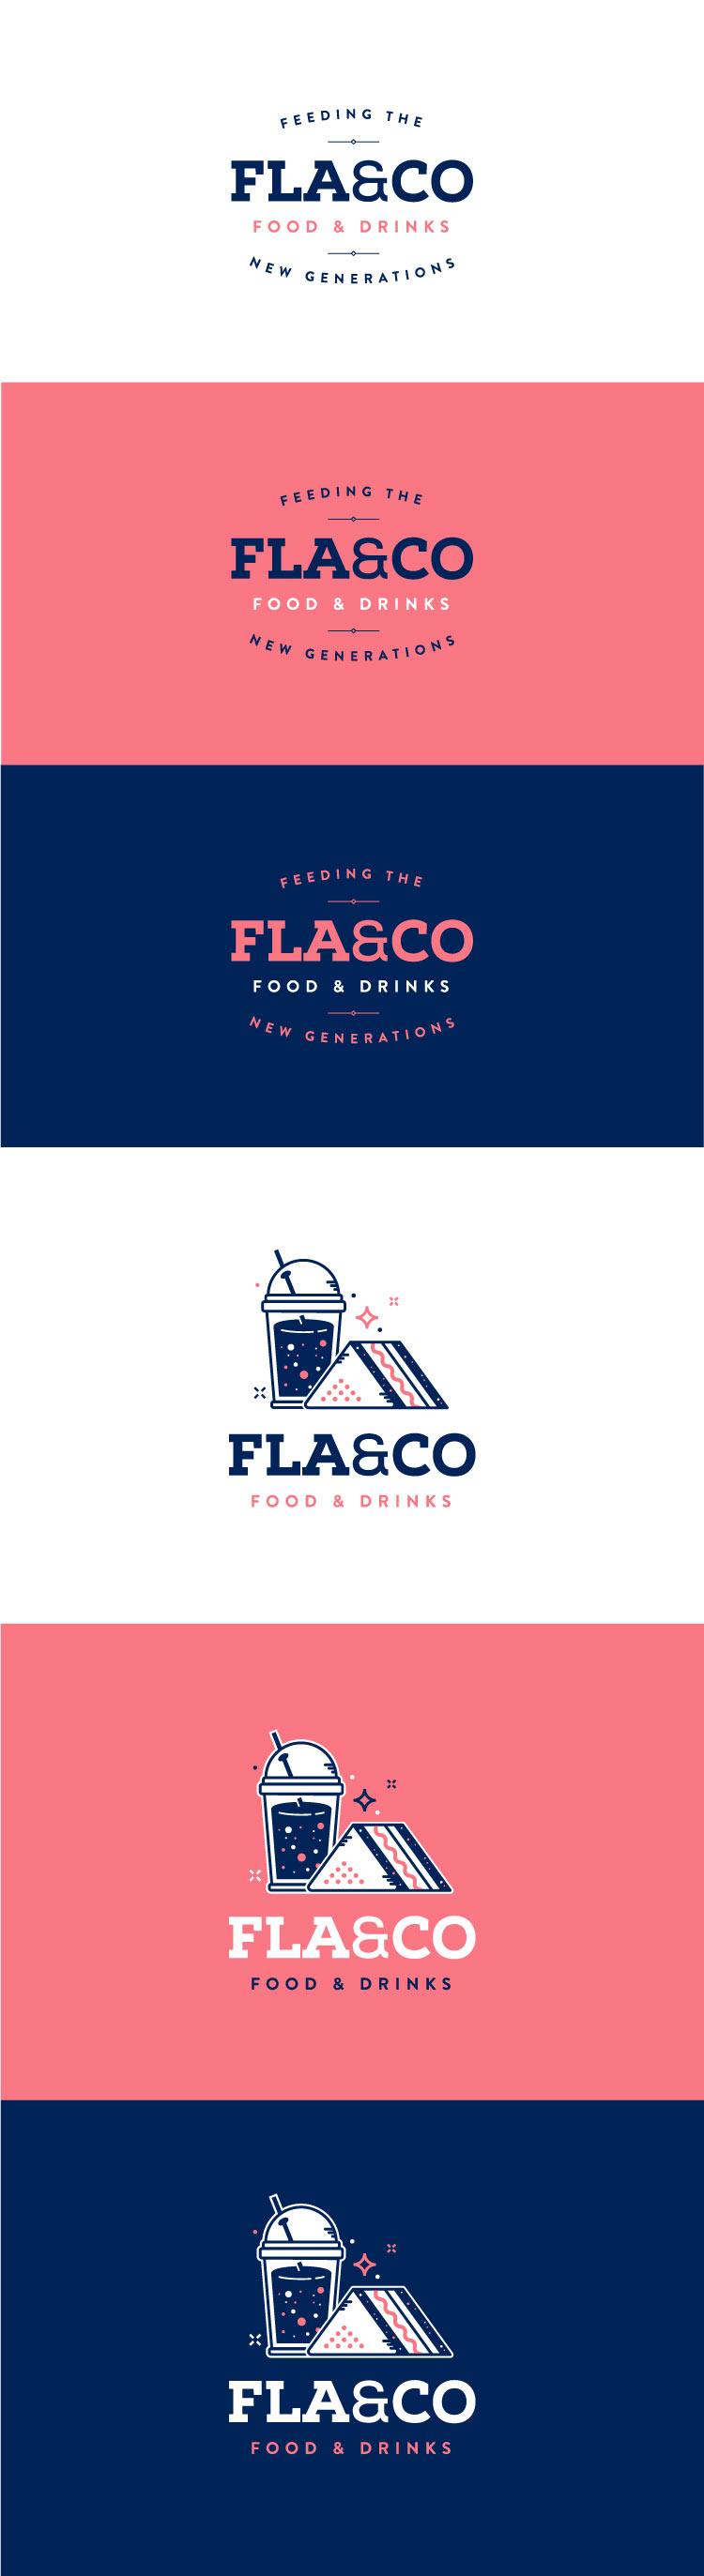 albertoojeda_flaco3